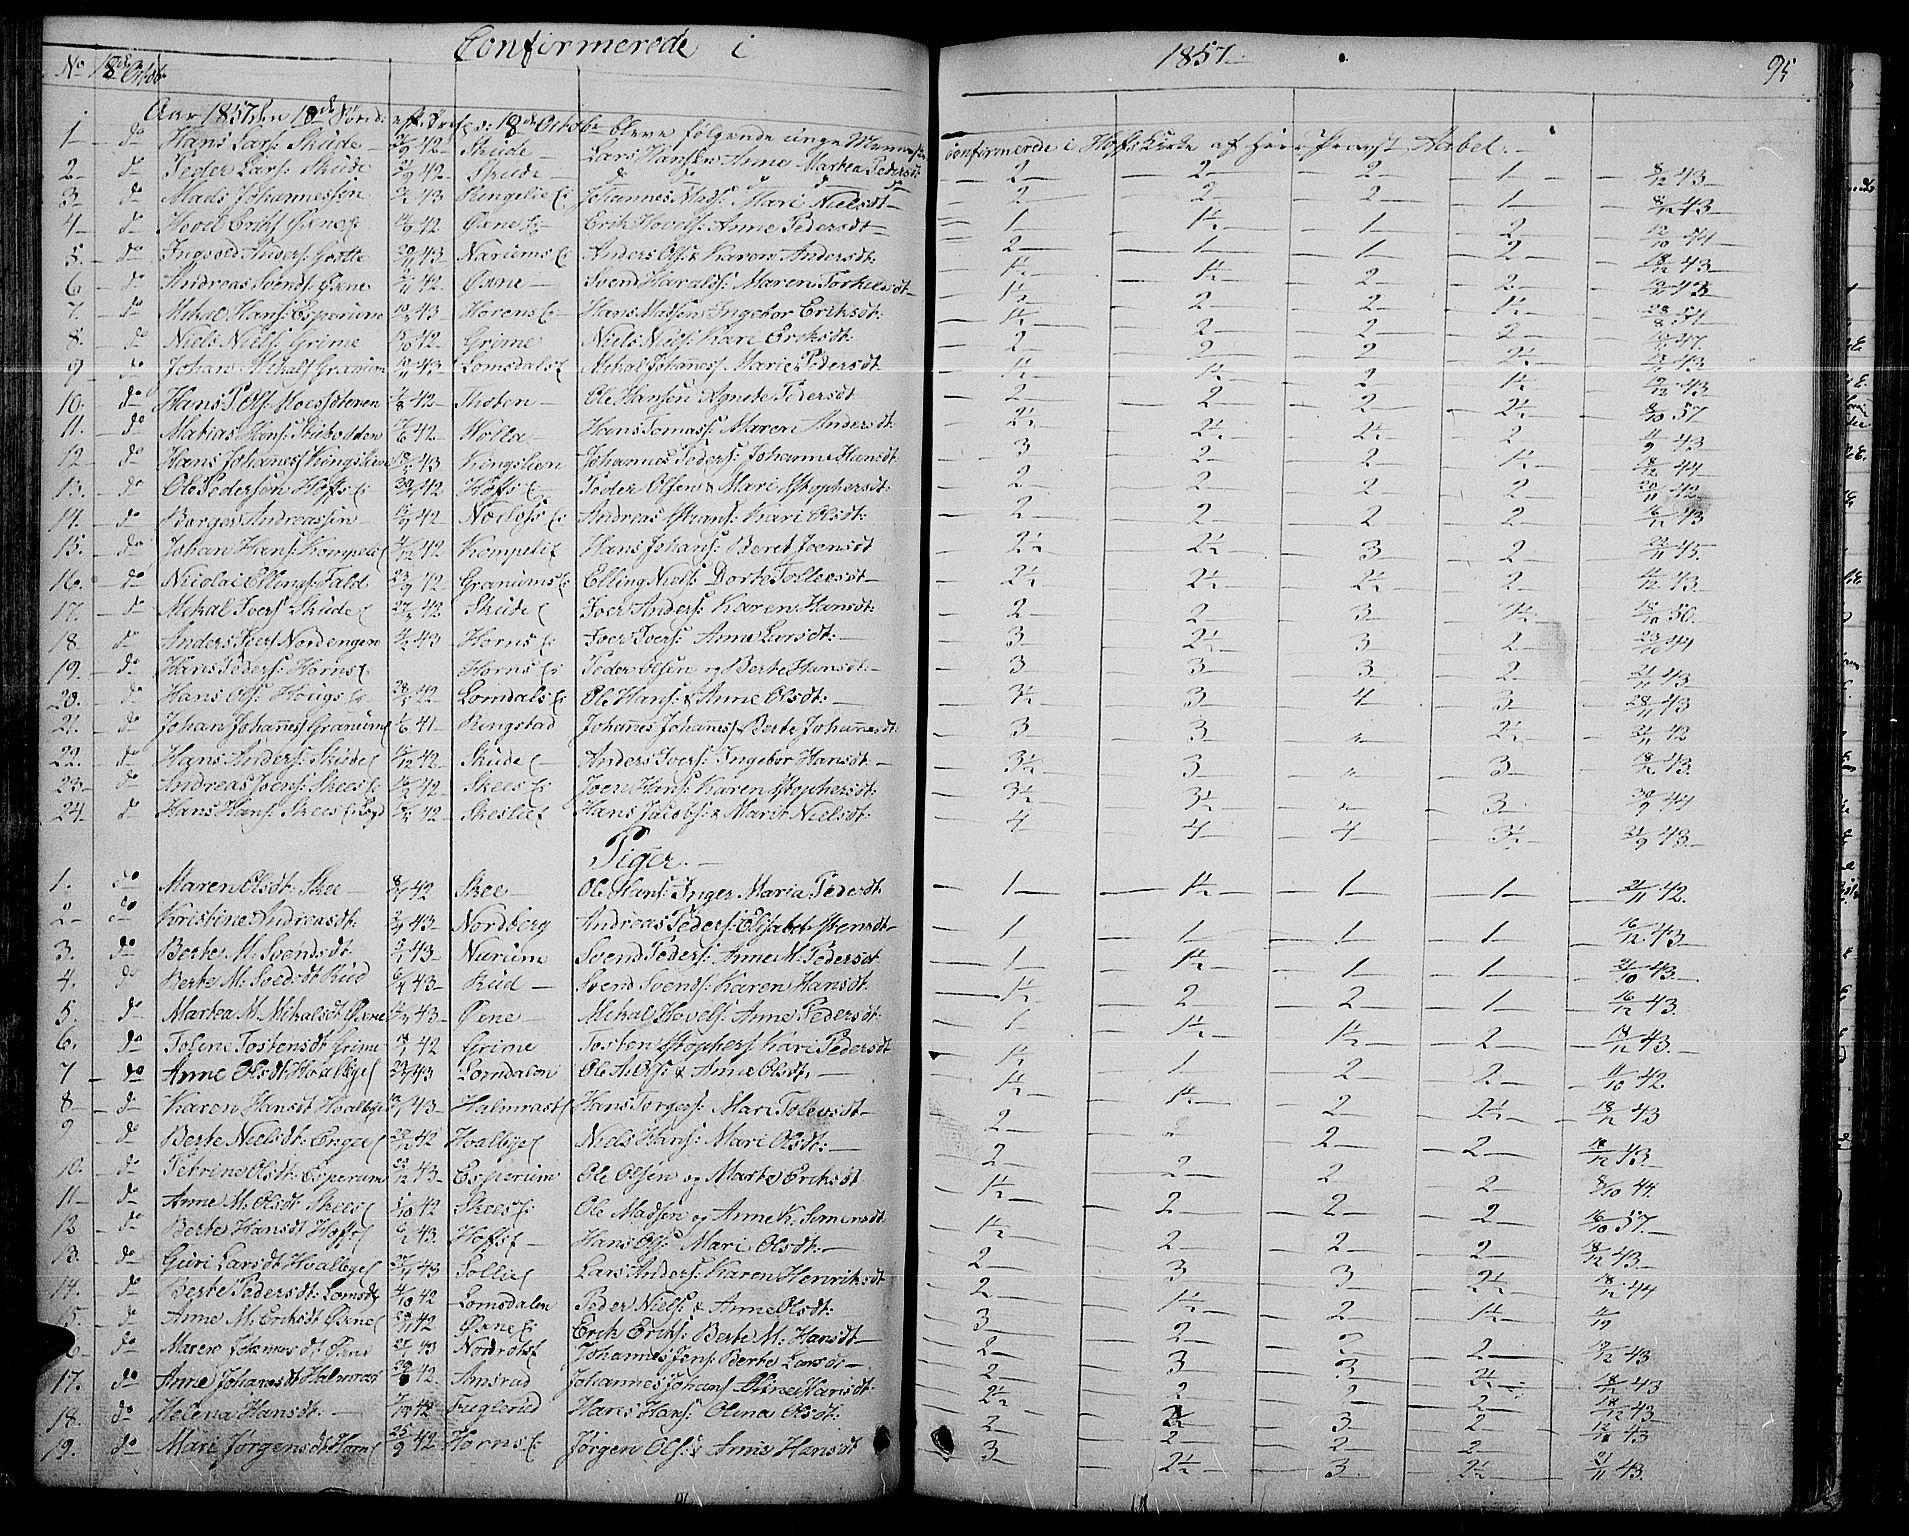 SAH, Søndre Land prestekontor, L/L0001: Klokkerbok nr. 1, 1849-1883, s. 95